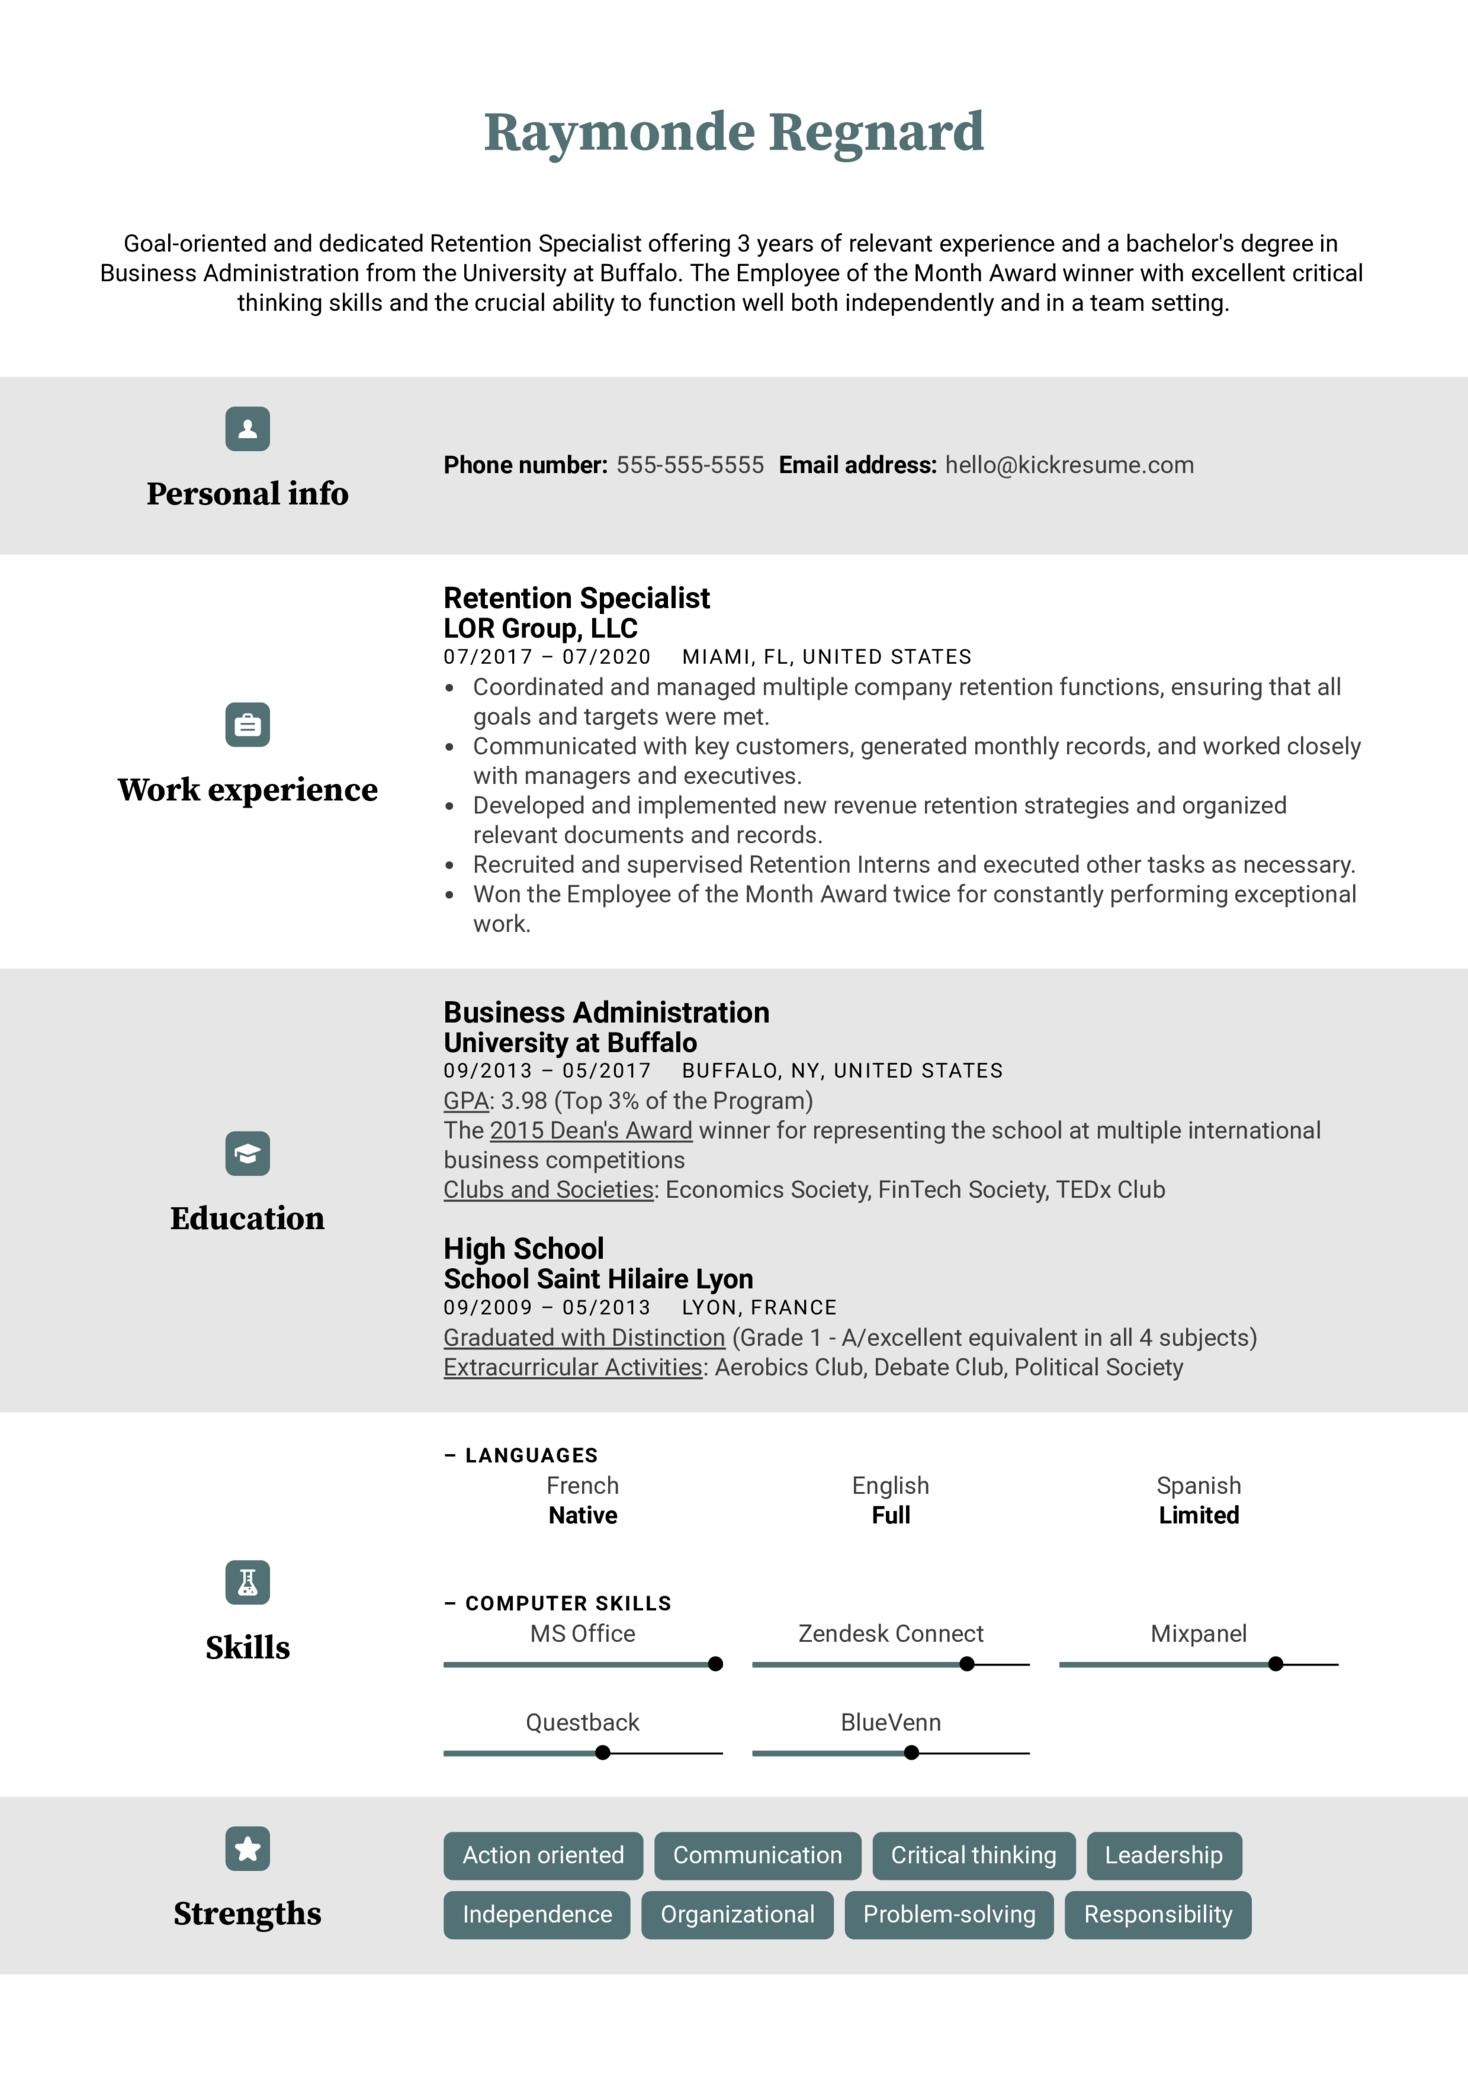 Retention Specialist Resume Example (Parte 1)